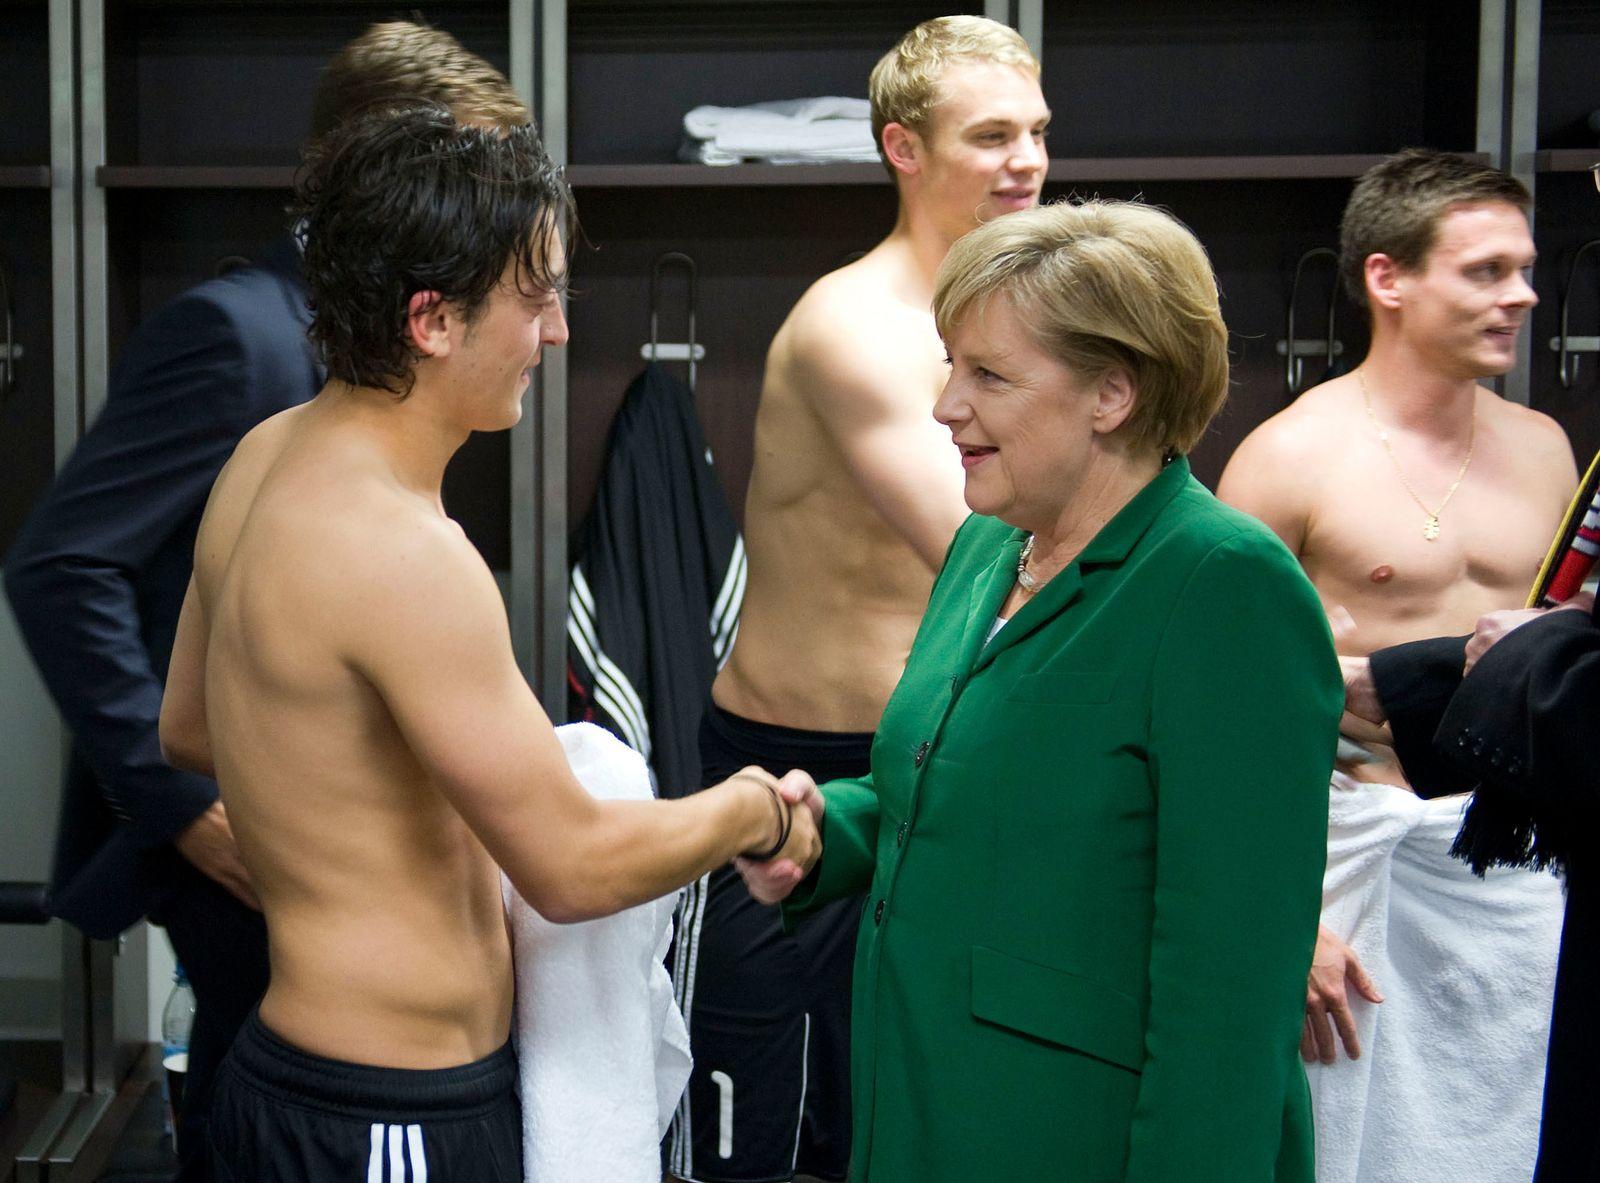 Mesut Özil/ Merkel